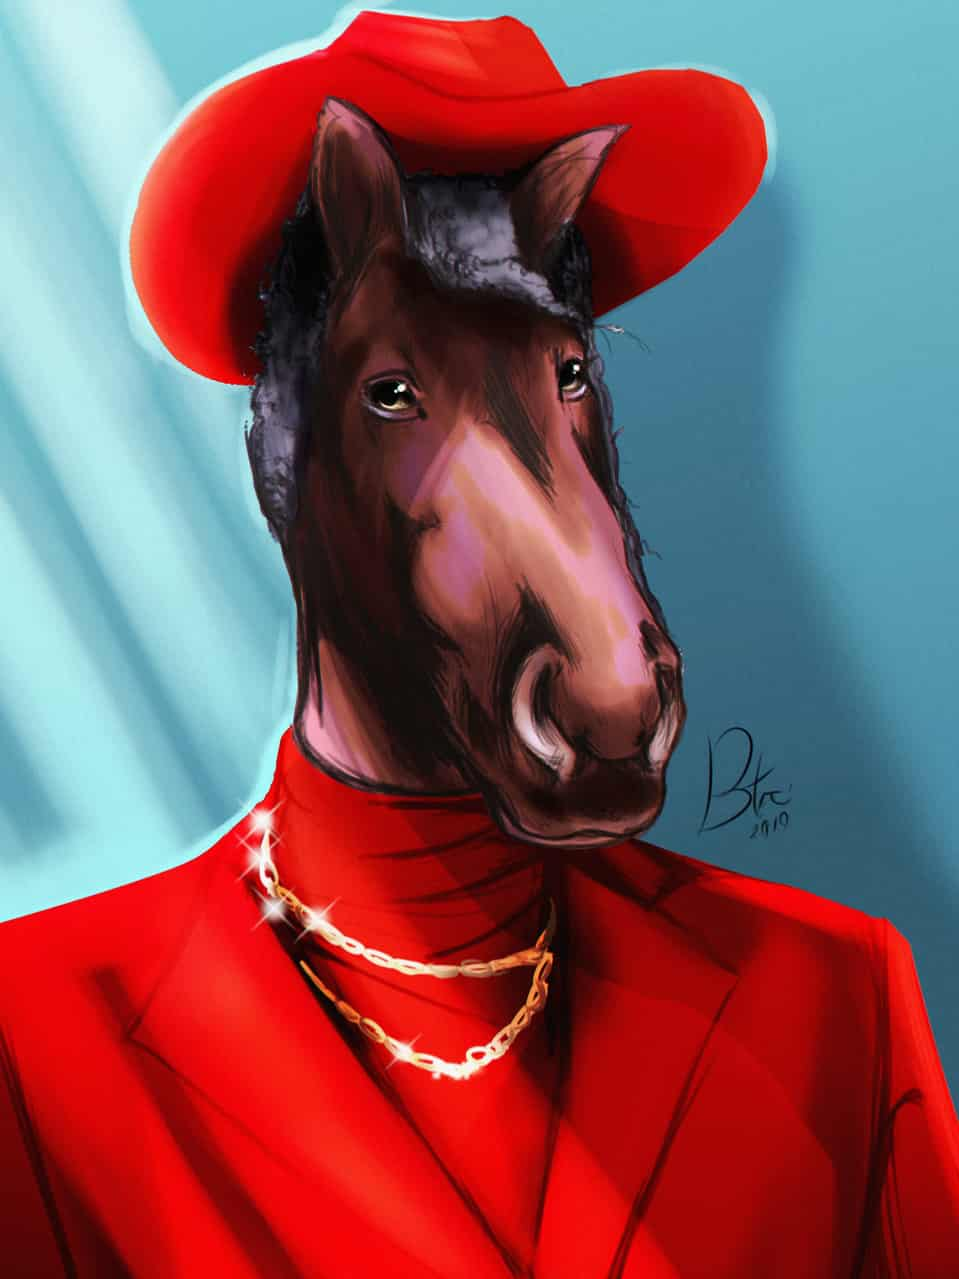 Lil Nas X / Red Rider